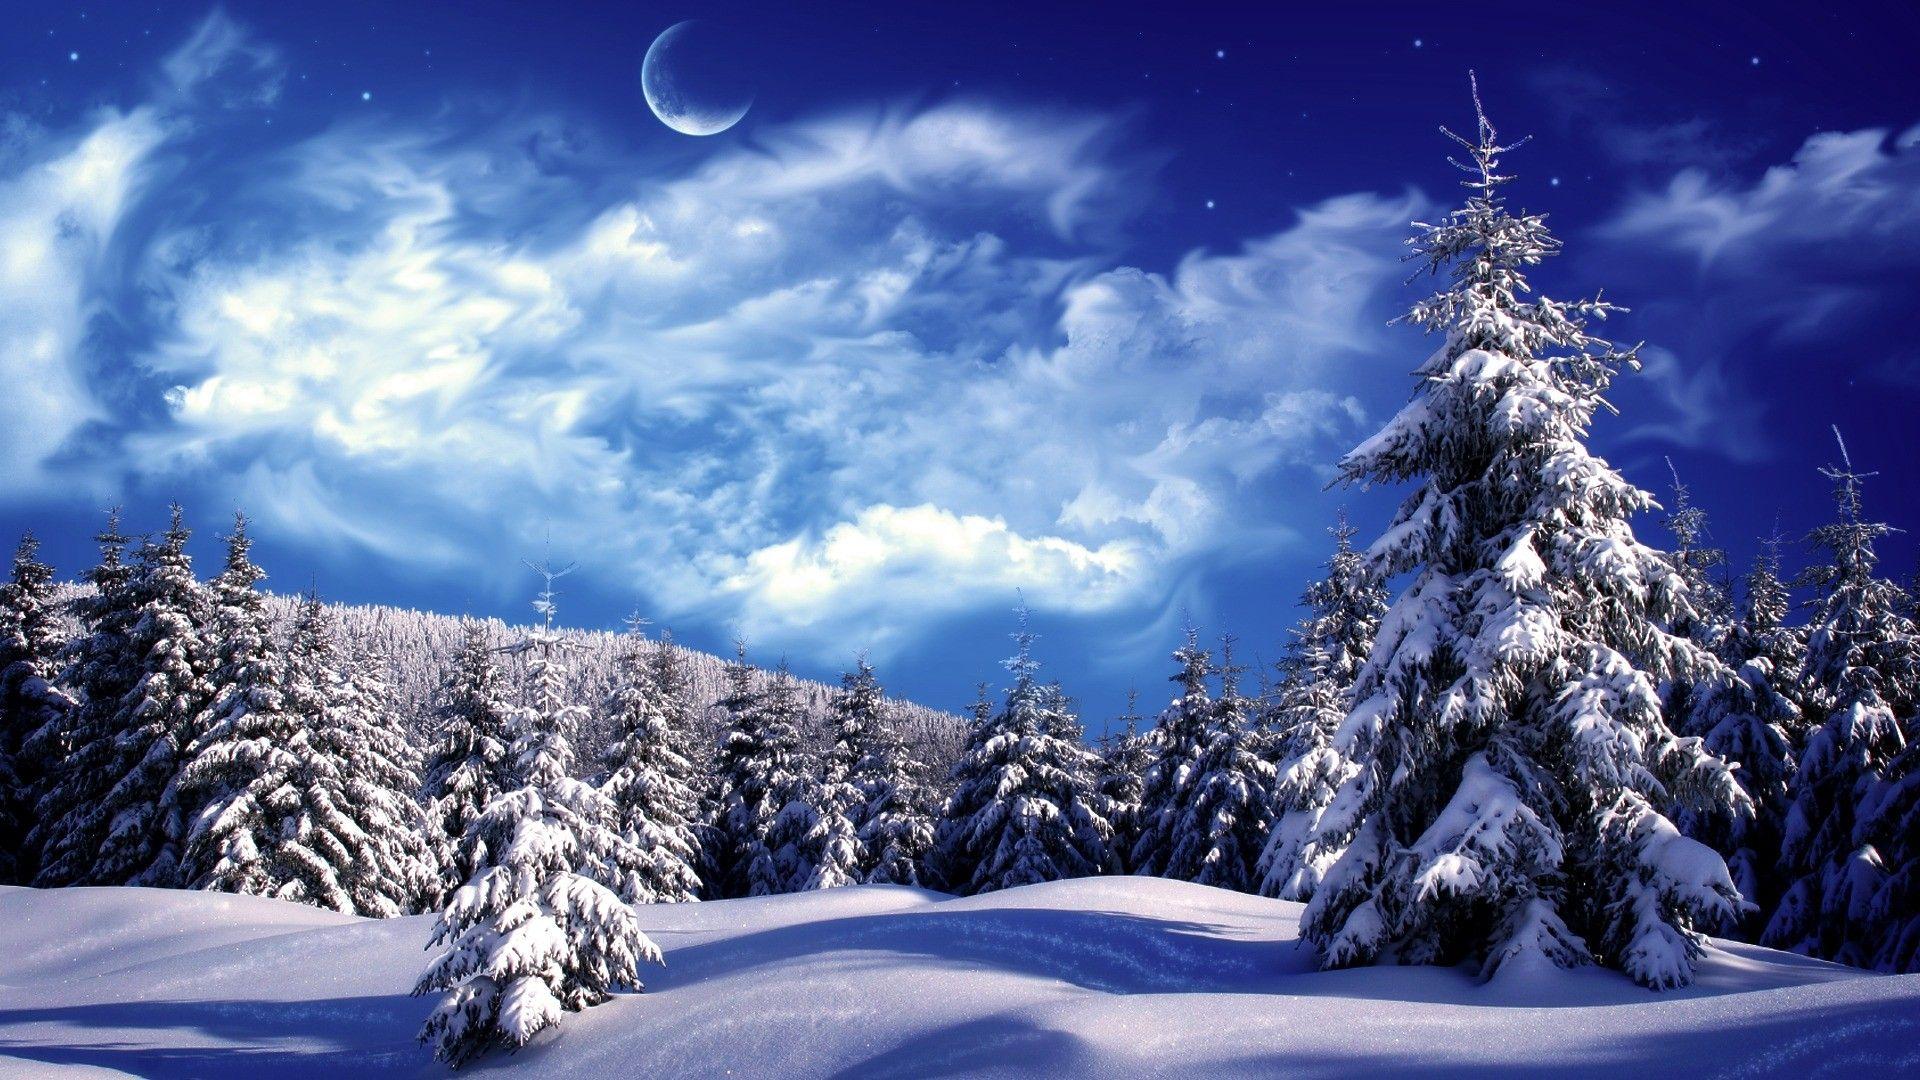 Cold Winter Night Fantastic Blue Sky Beautiful Nature Landscapes Desktop Wallpapers Awsome Landscape Wa Winter Scenery Winter Wallpaper Hd Winter Landscape